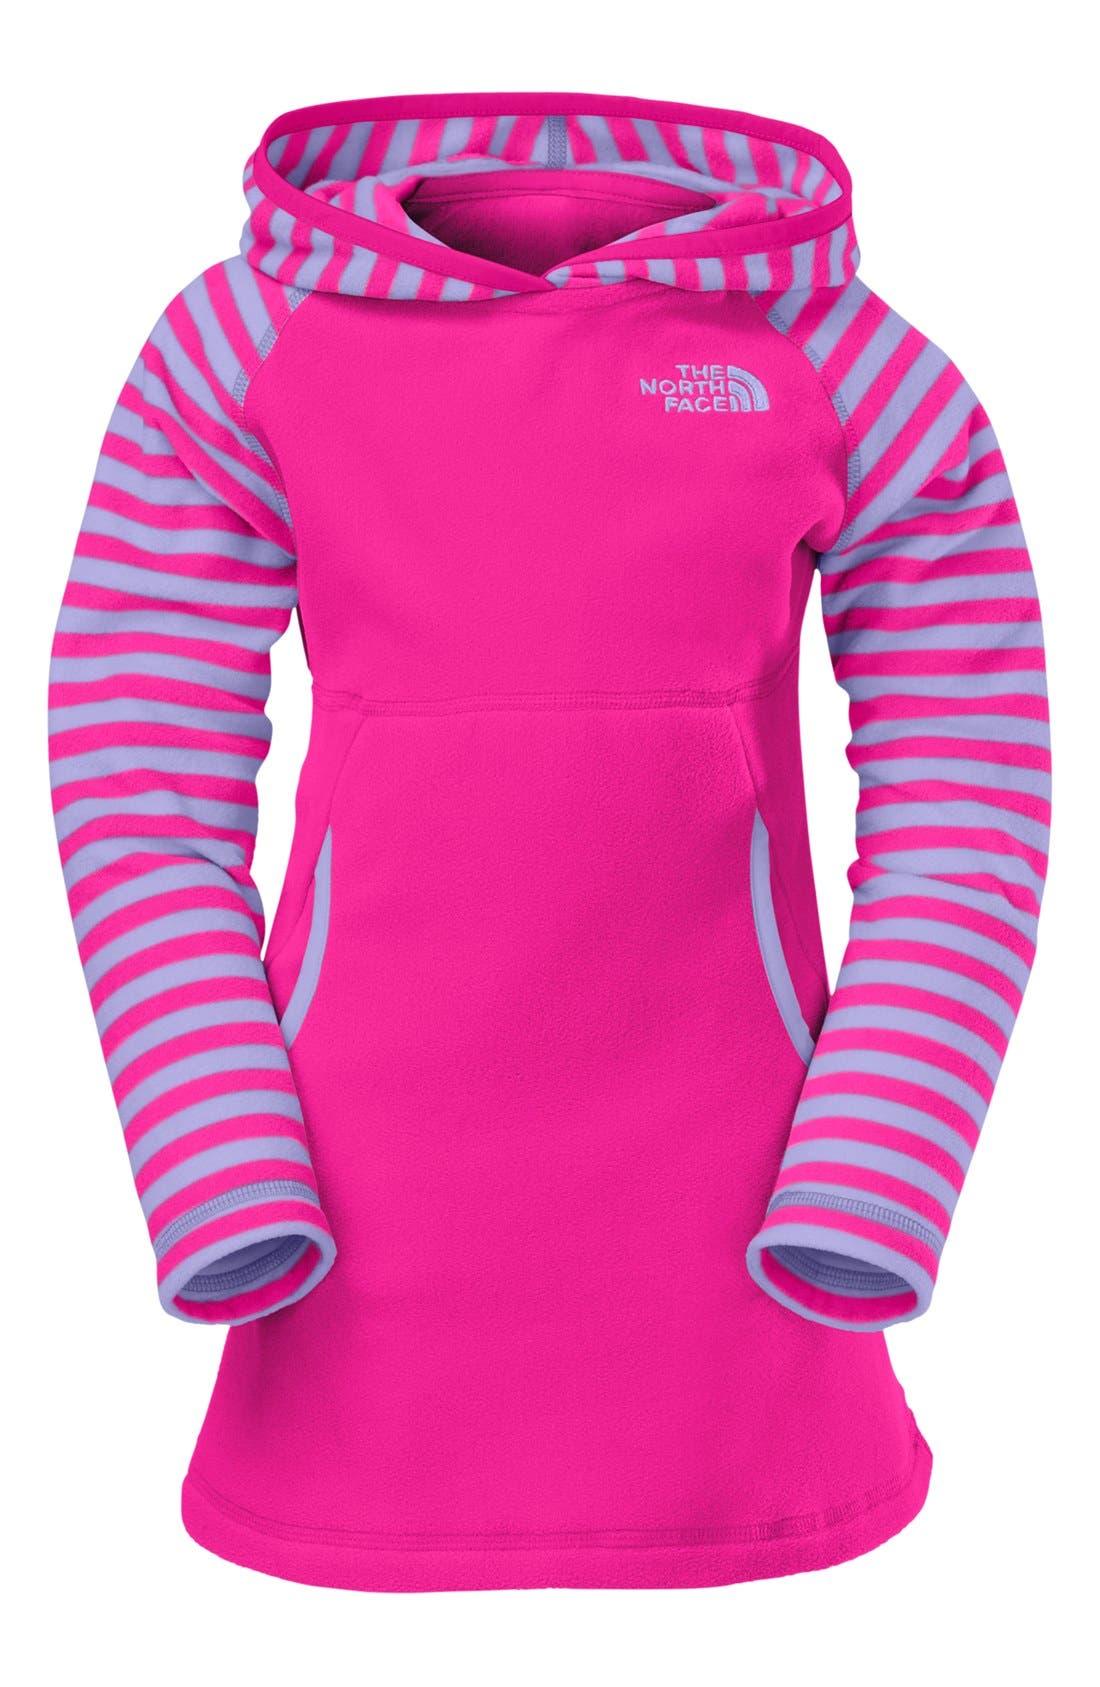 Main Image - The North Face 'Glacier' Dress (Toddler Girls)